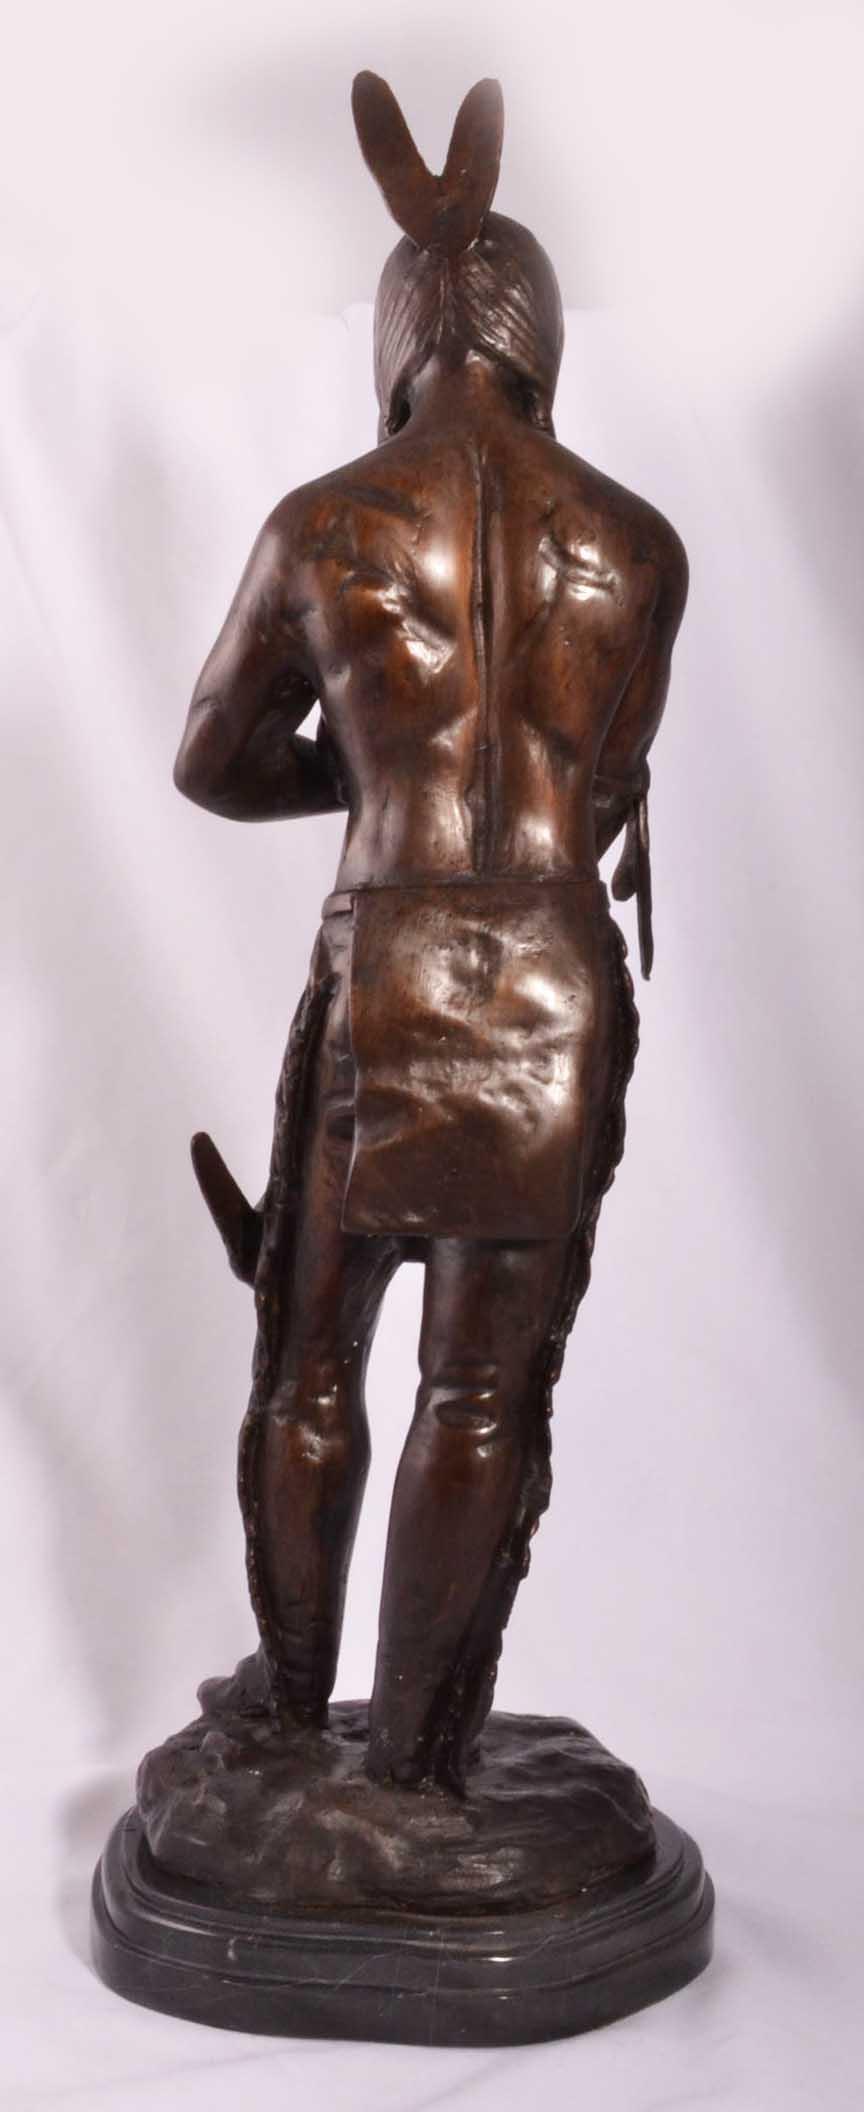 Regent Antiques Bronzes Native American Indian Bronze